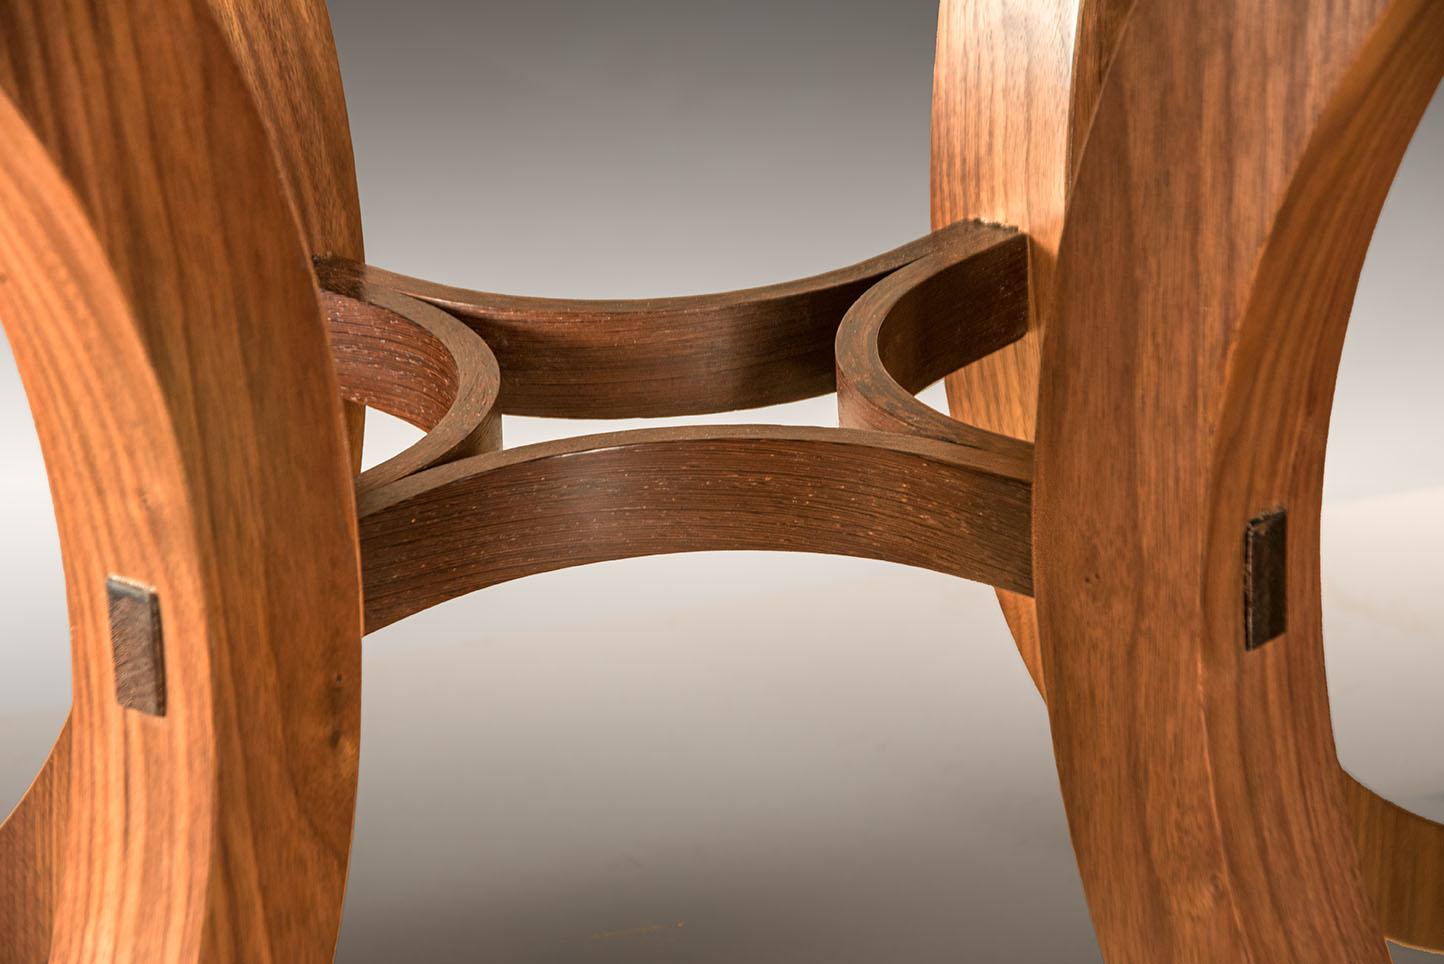 khls-table-stretcher-detail-6146-sm.jpg